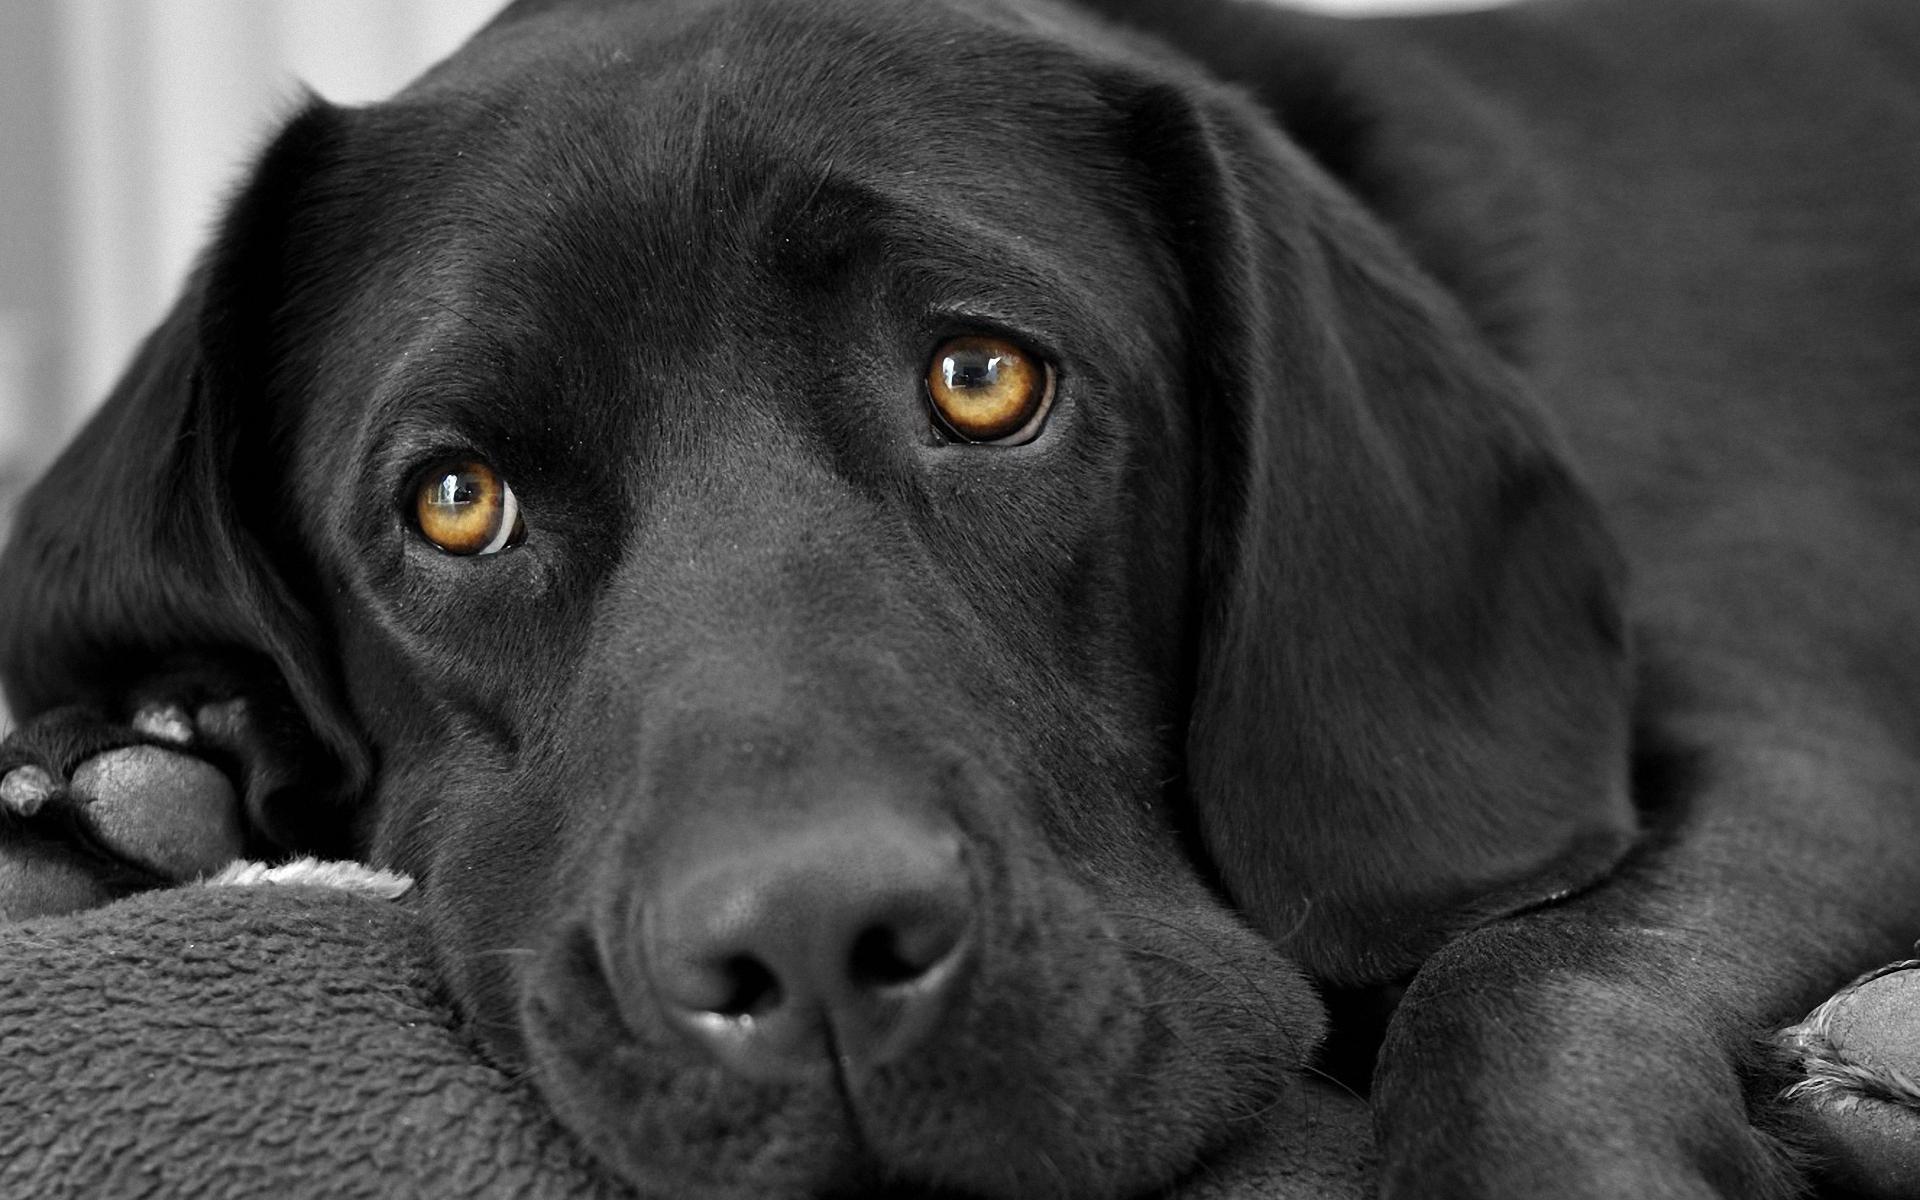 animals_widewallpaper_magic-dog-eyes_71436